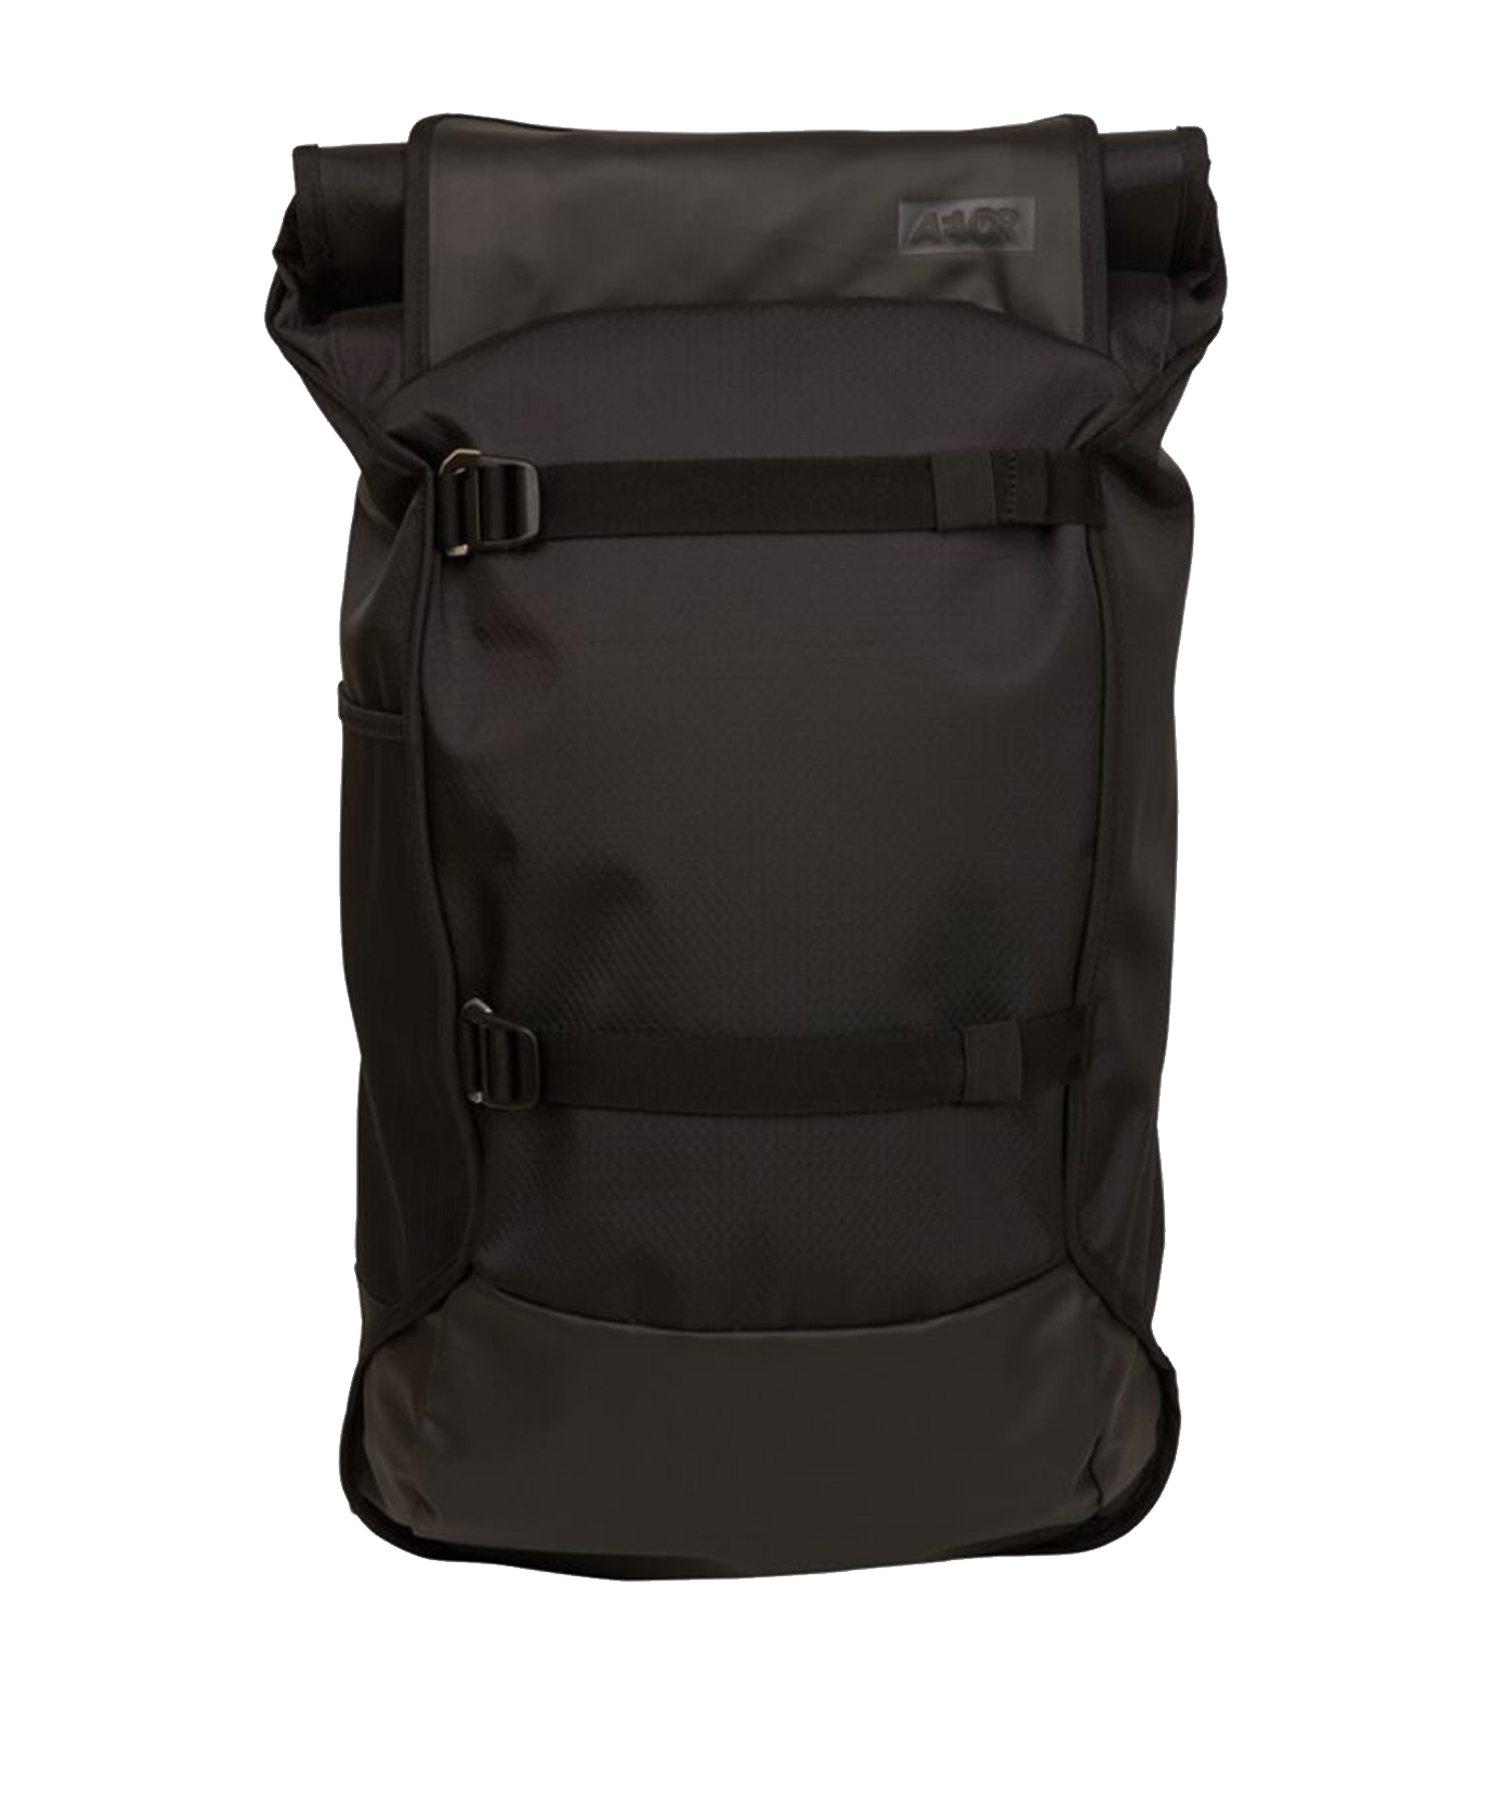 AEVOR Backpack Trip Proof Rucksack Schwarz F801 - schwarz